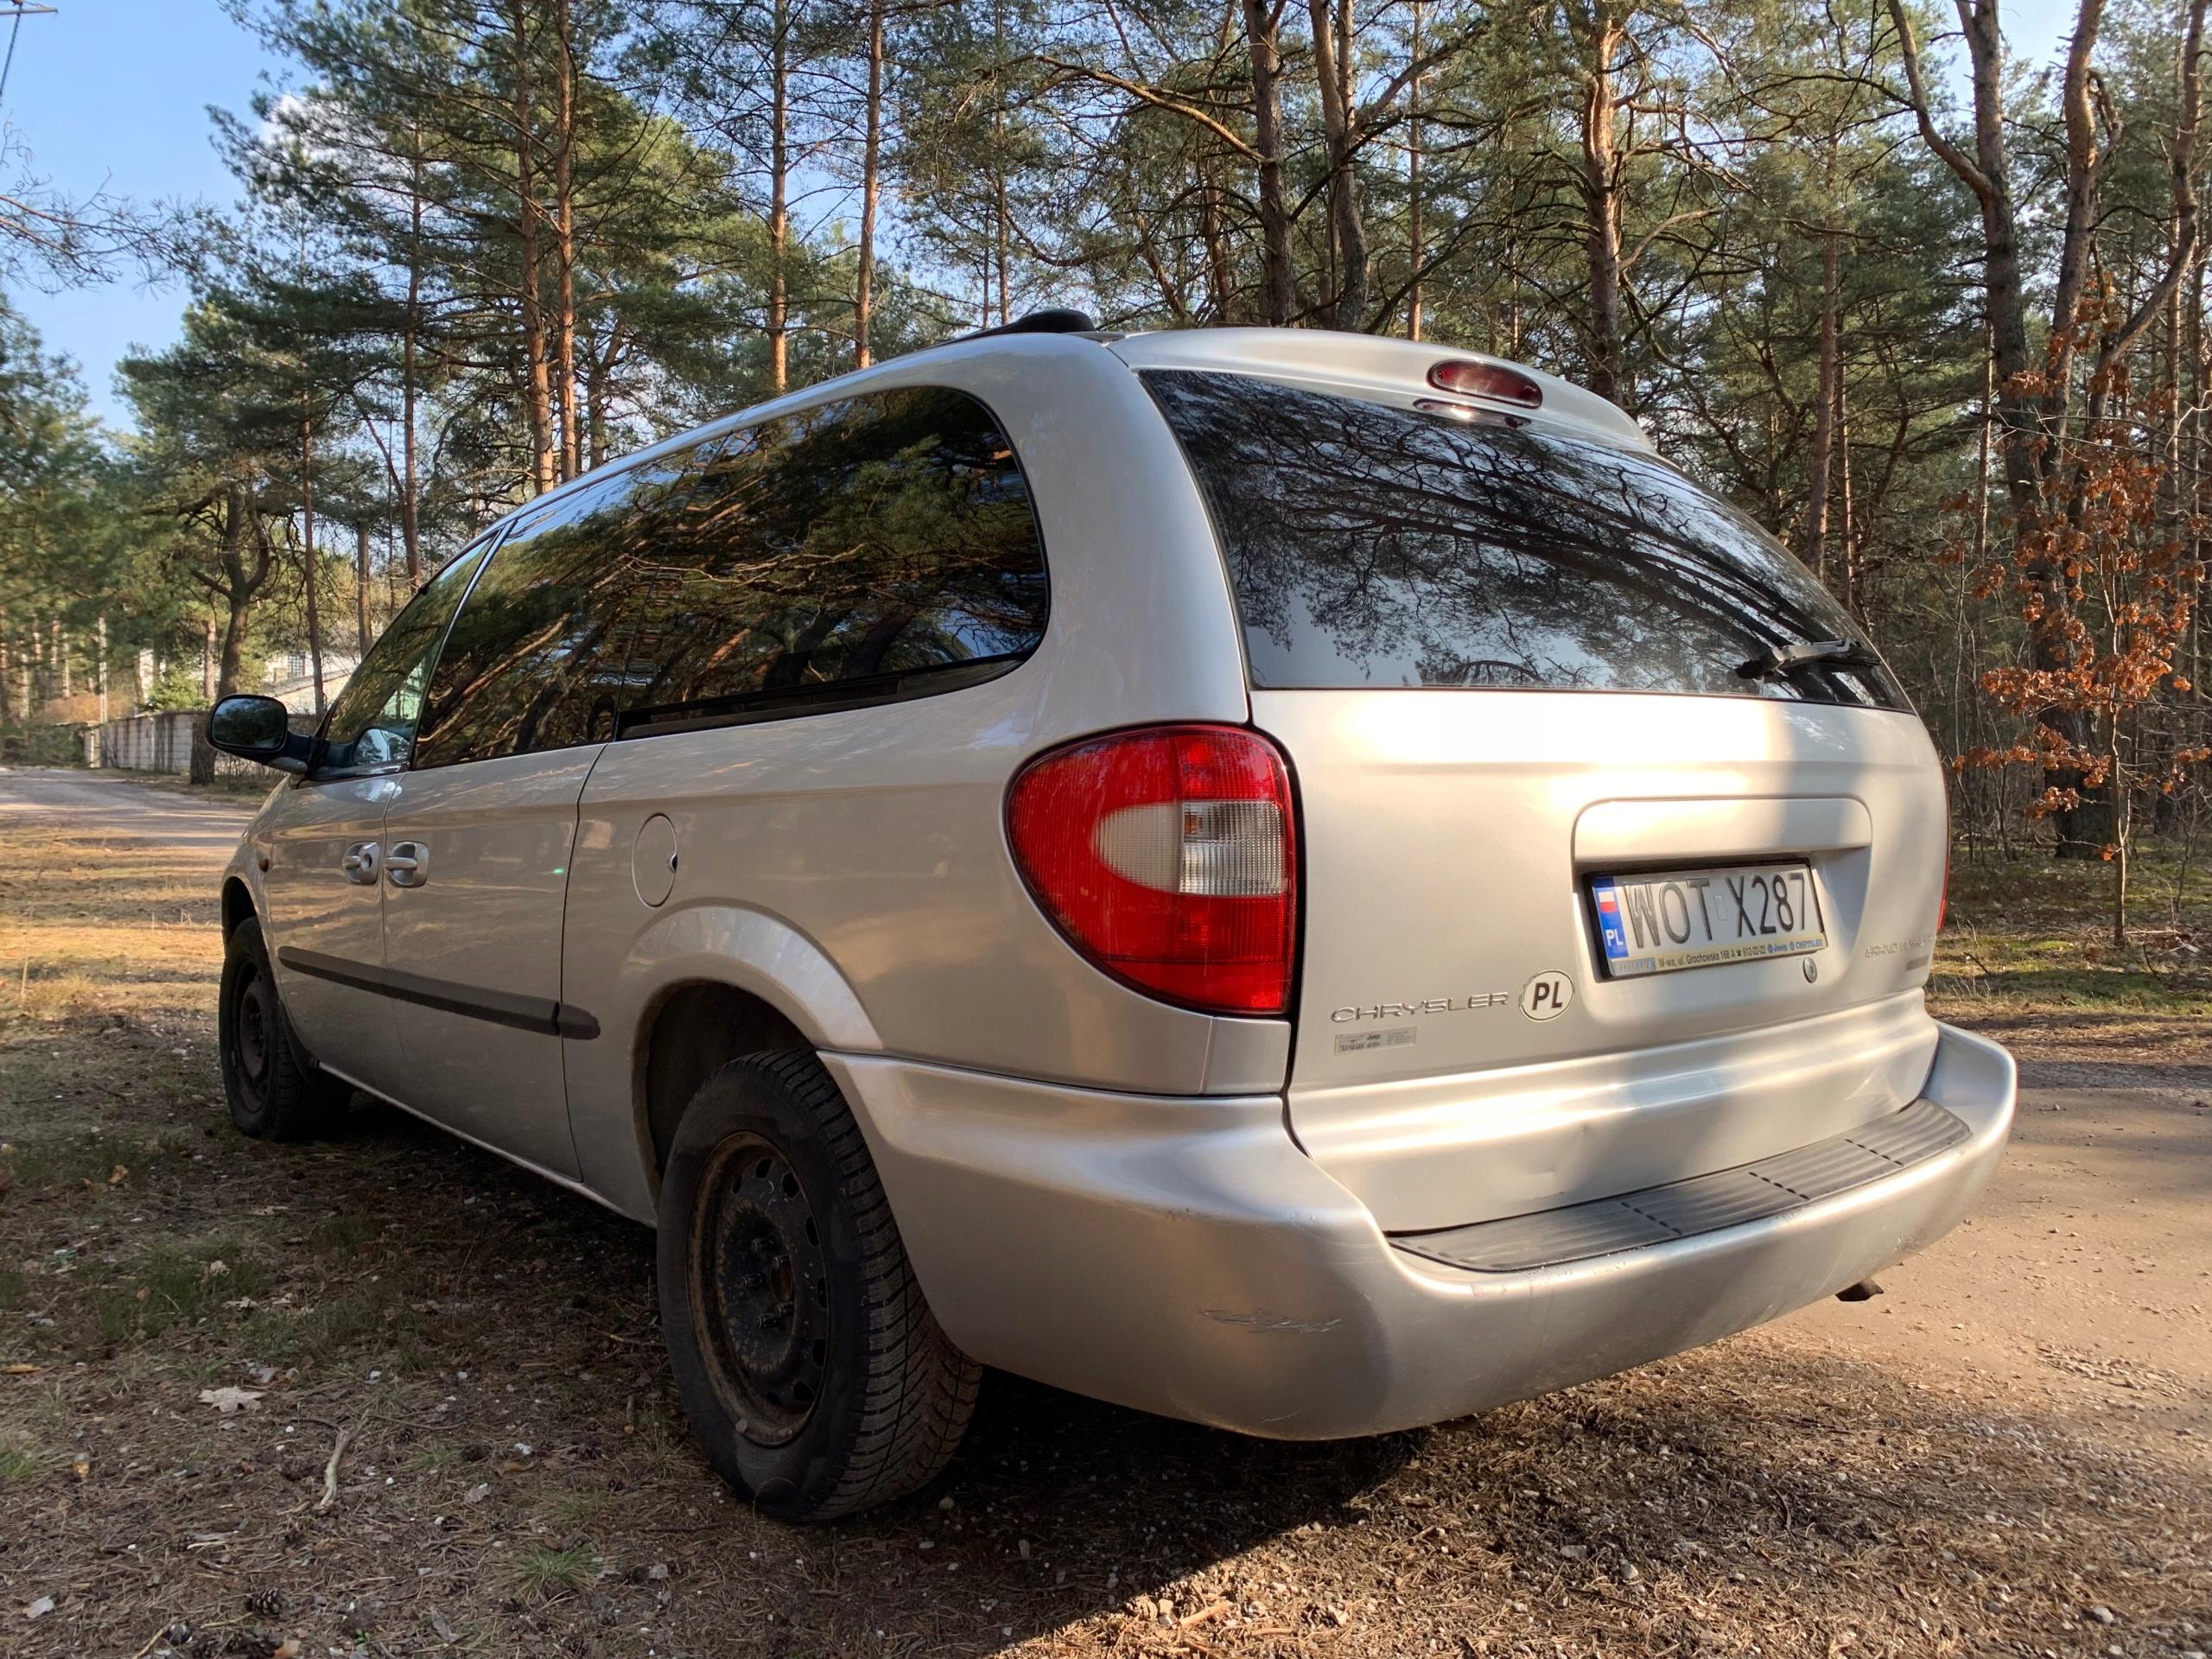 Chrysler Grand Voyager 2 5 Crd Rok Prod  2002